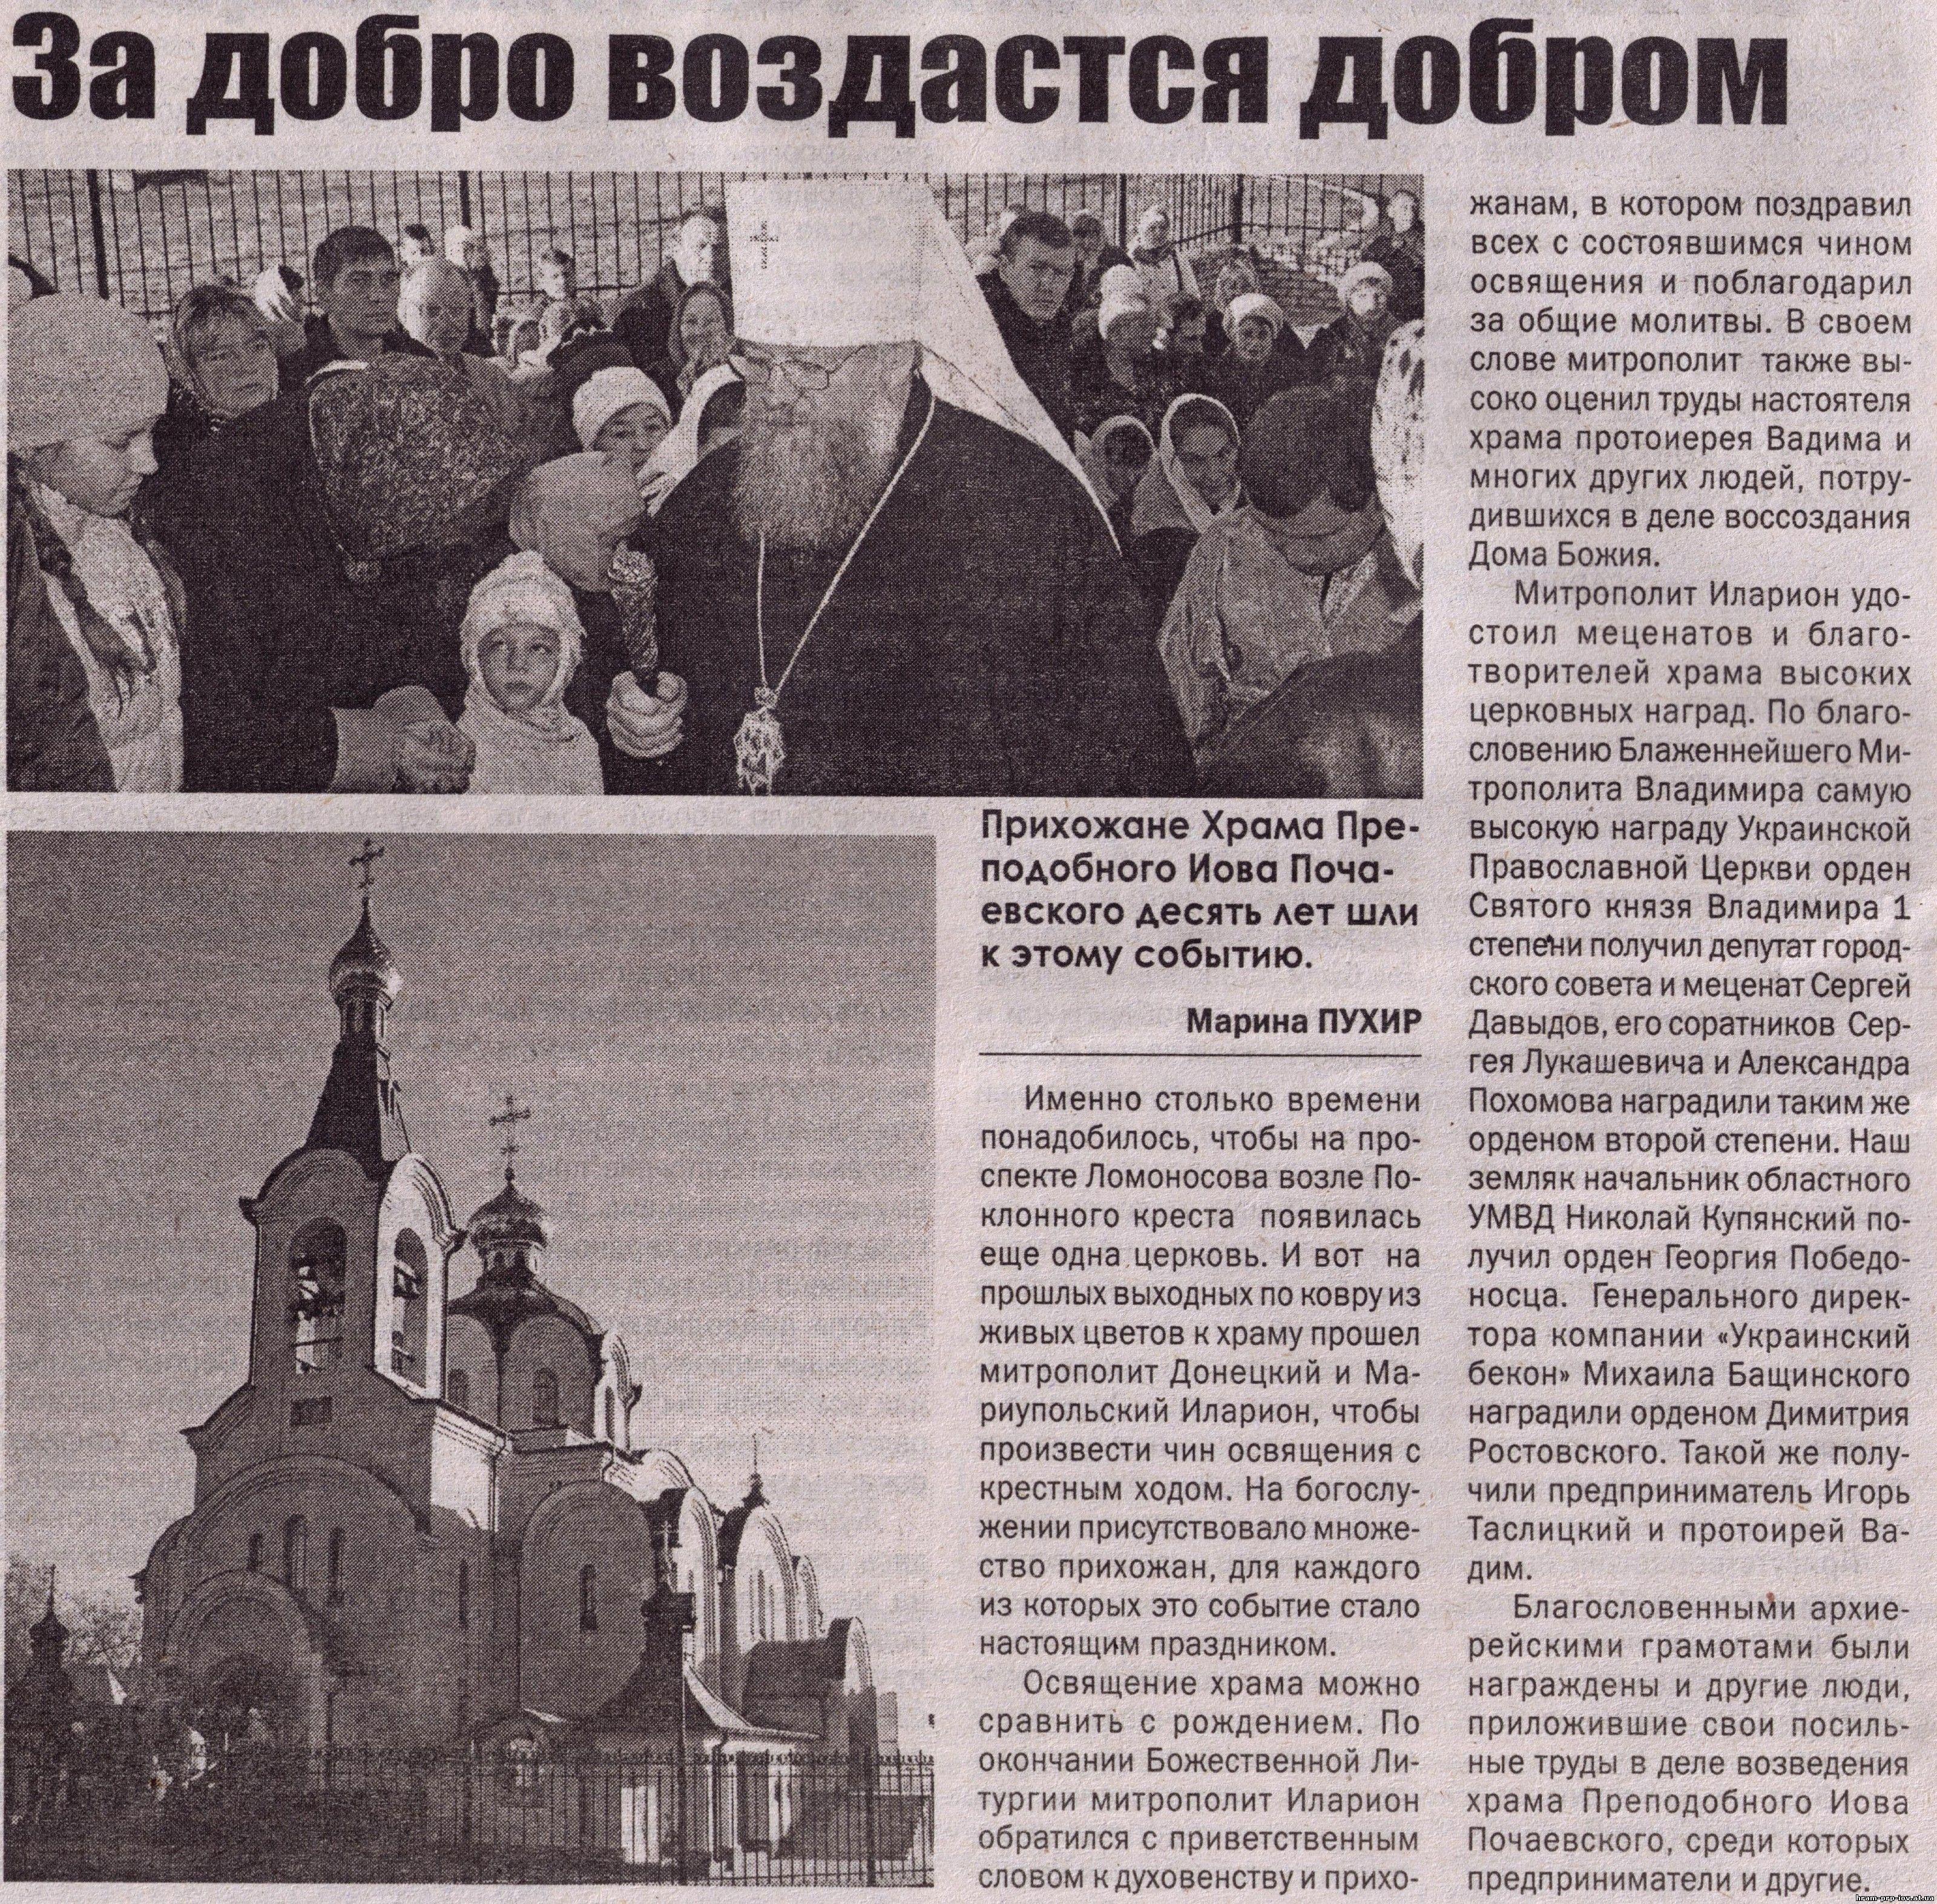 газета клипарт: